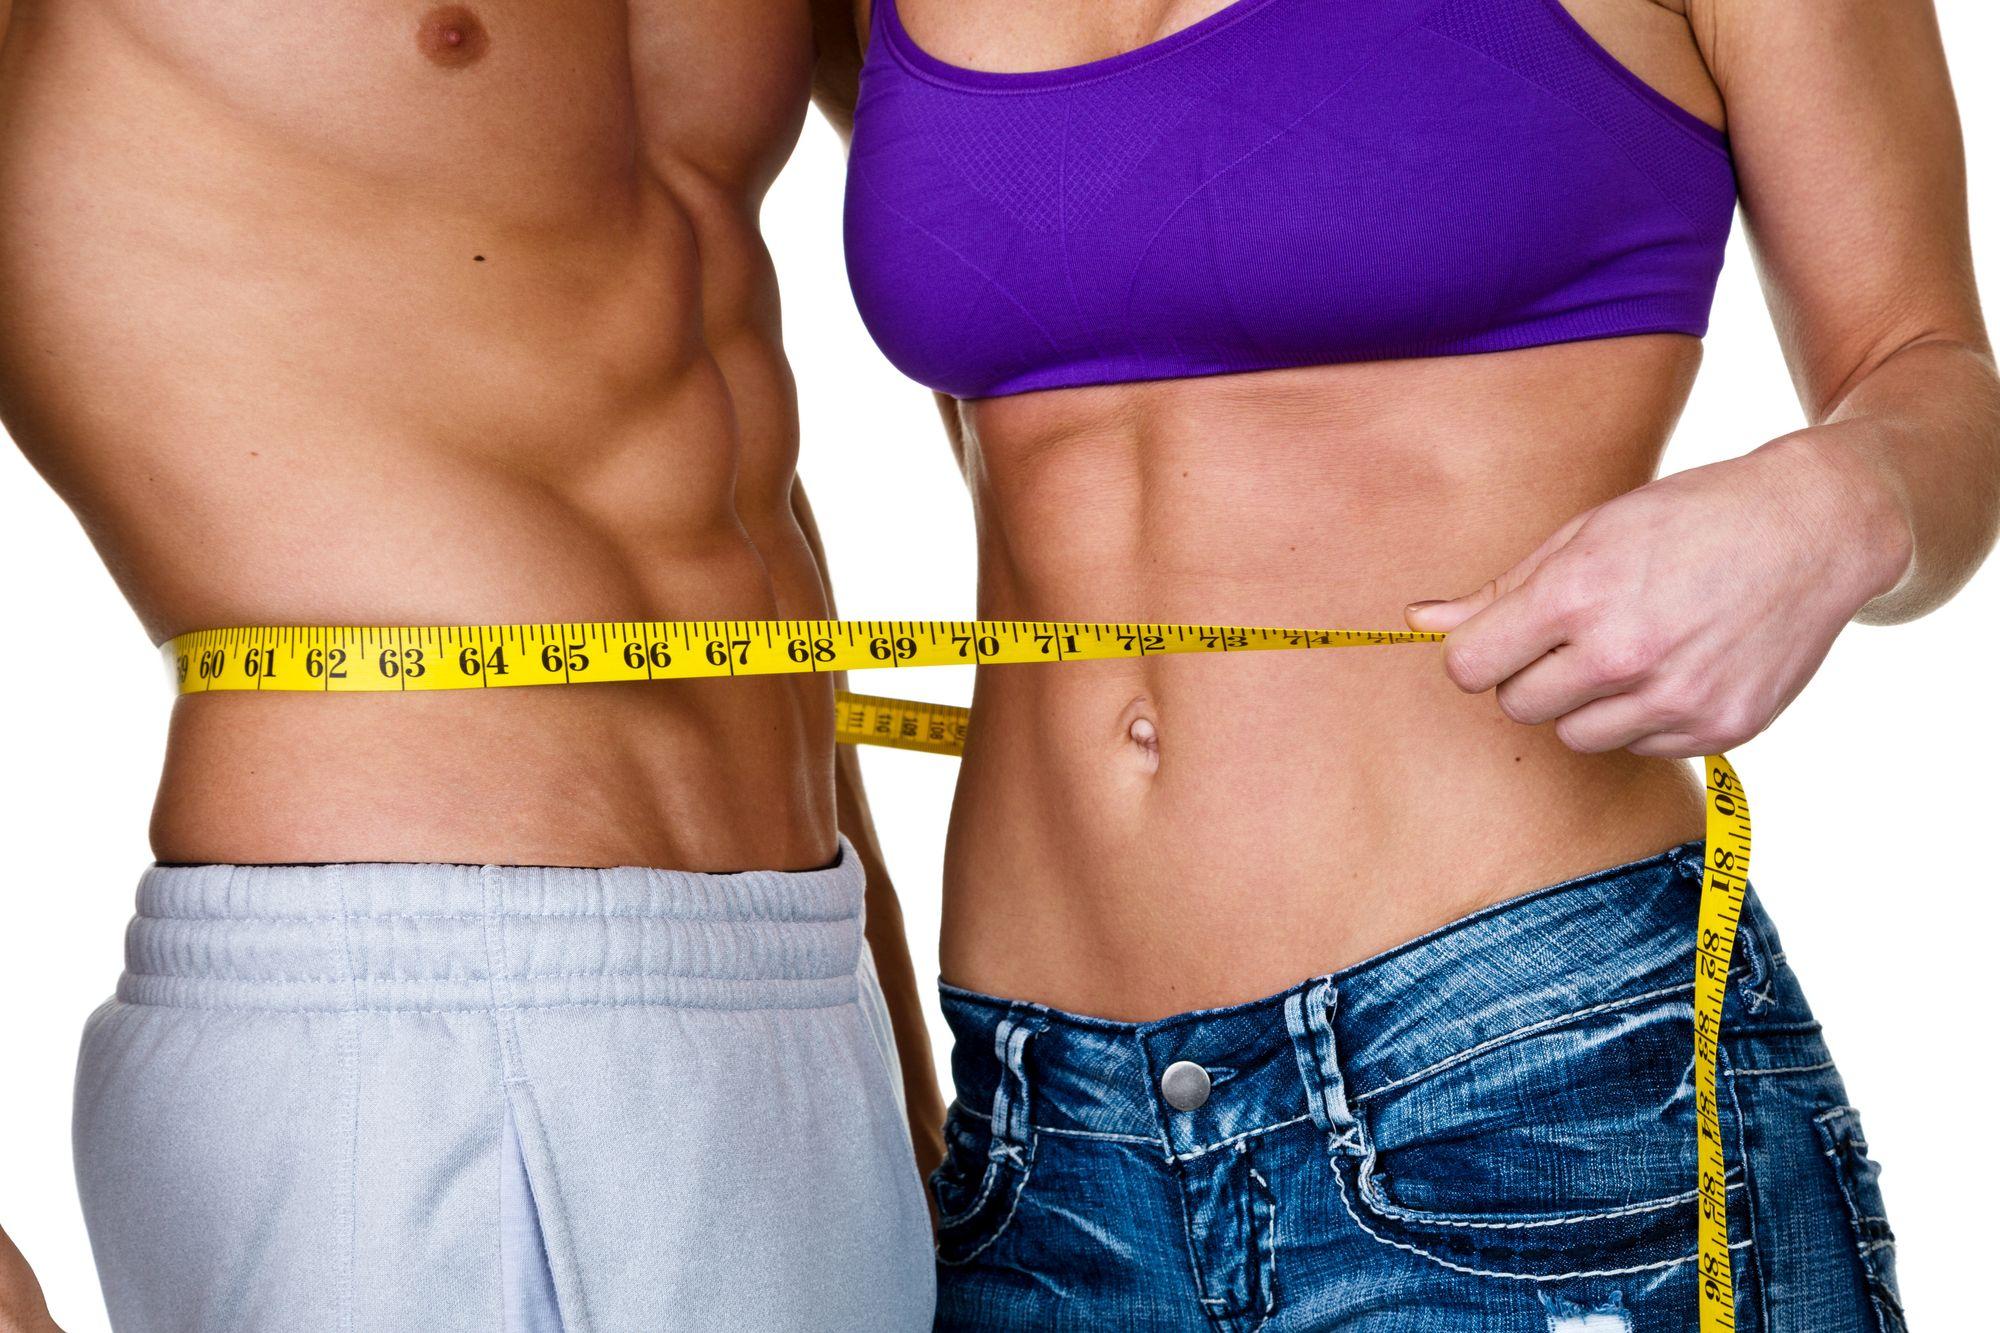 b complex fat loss